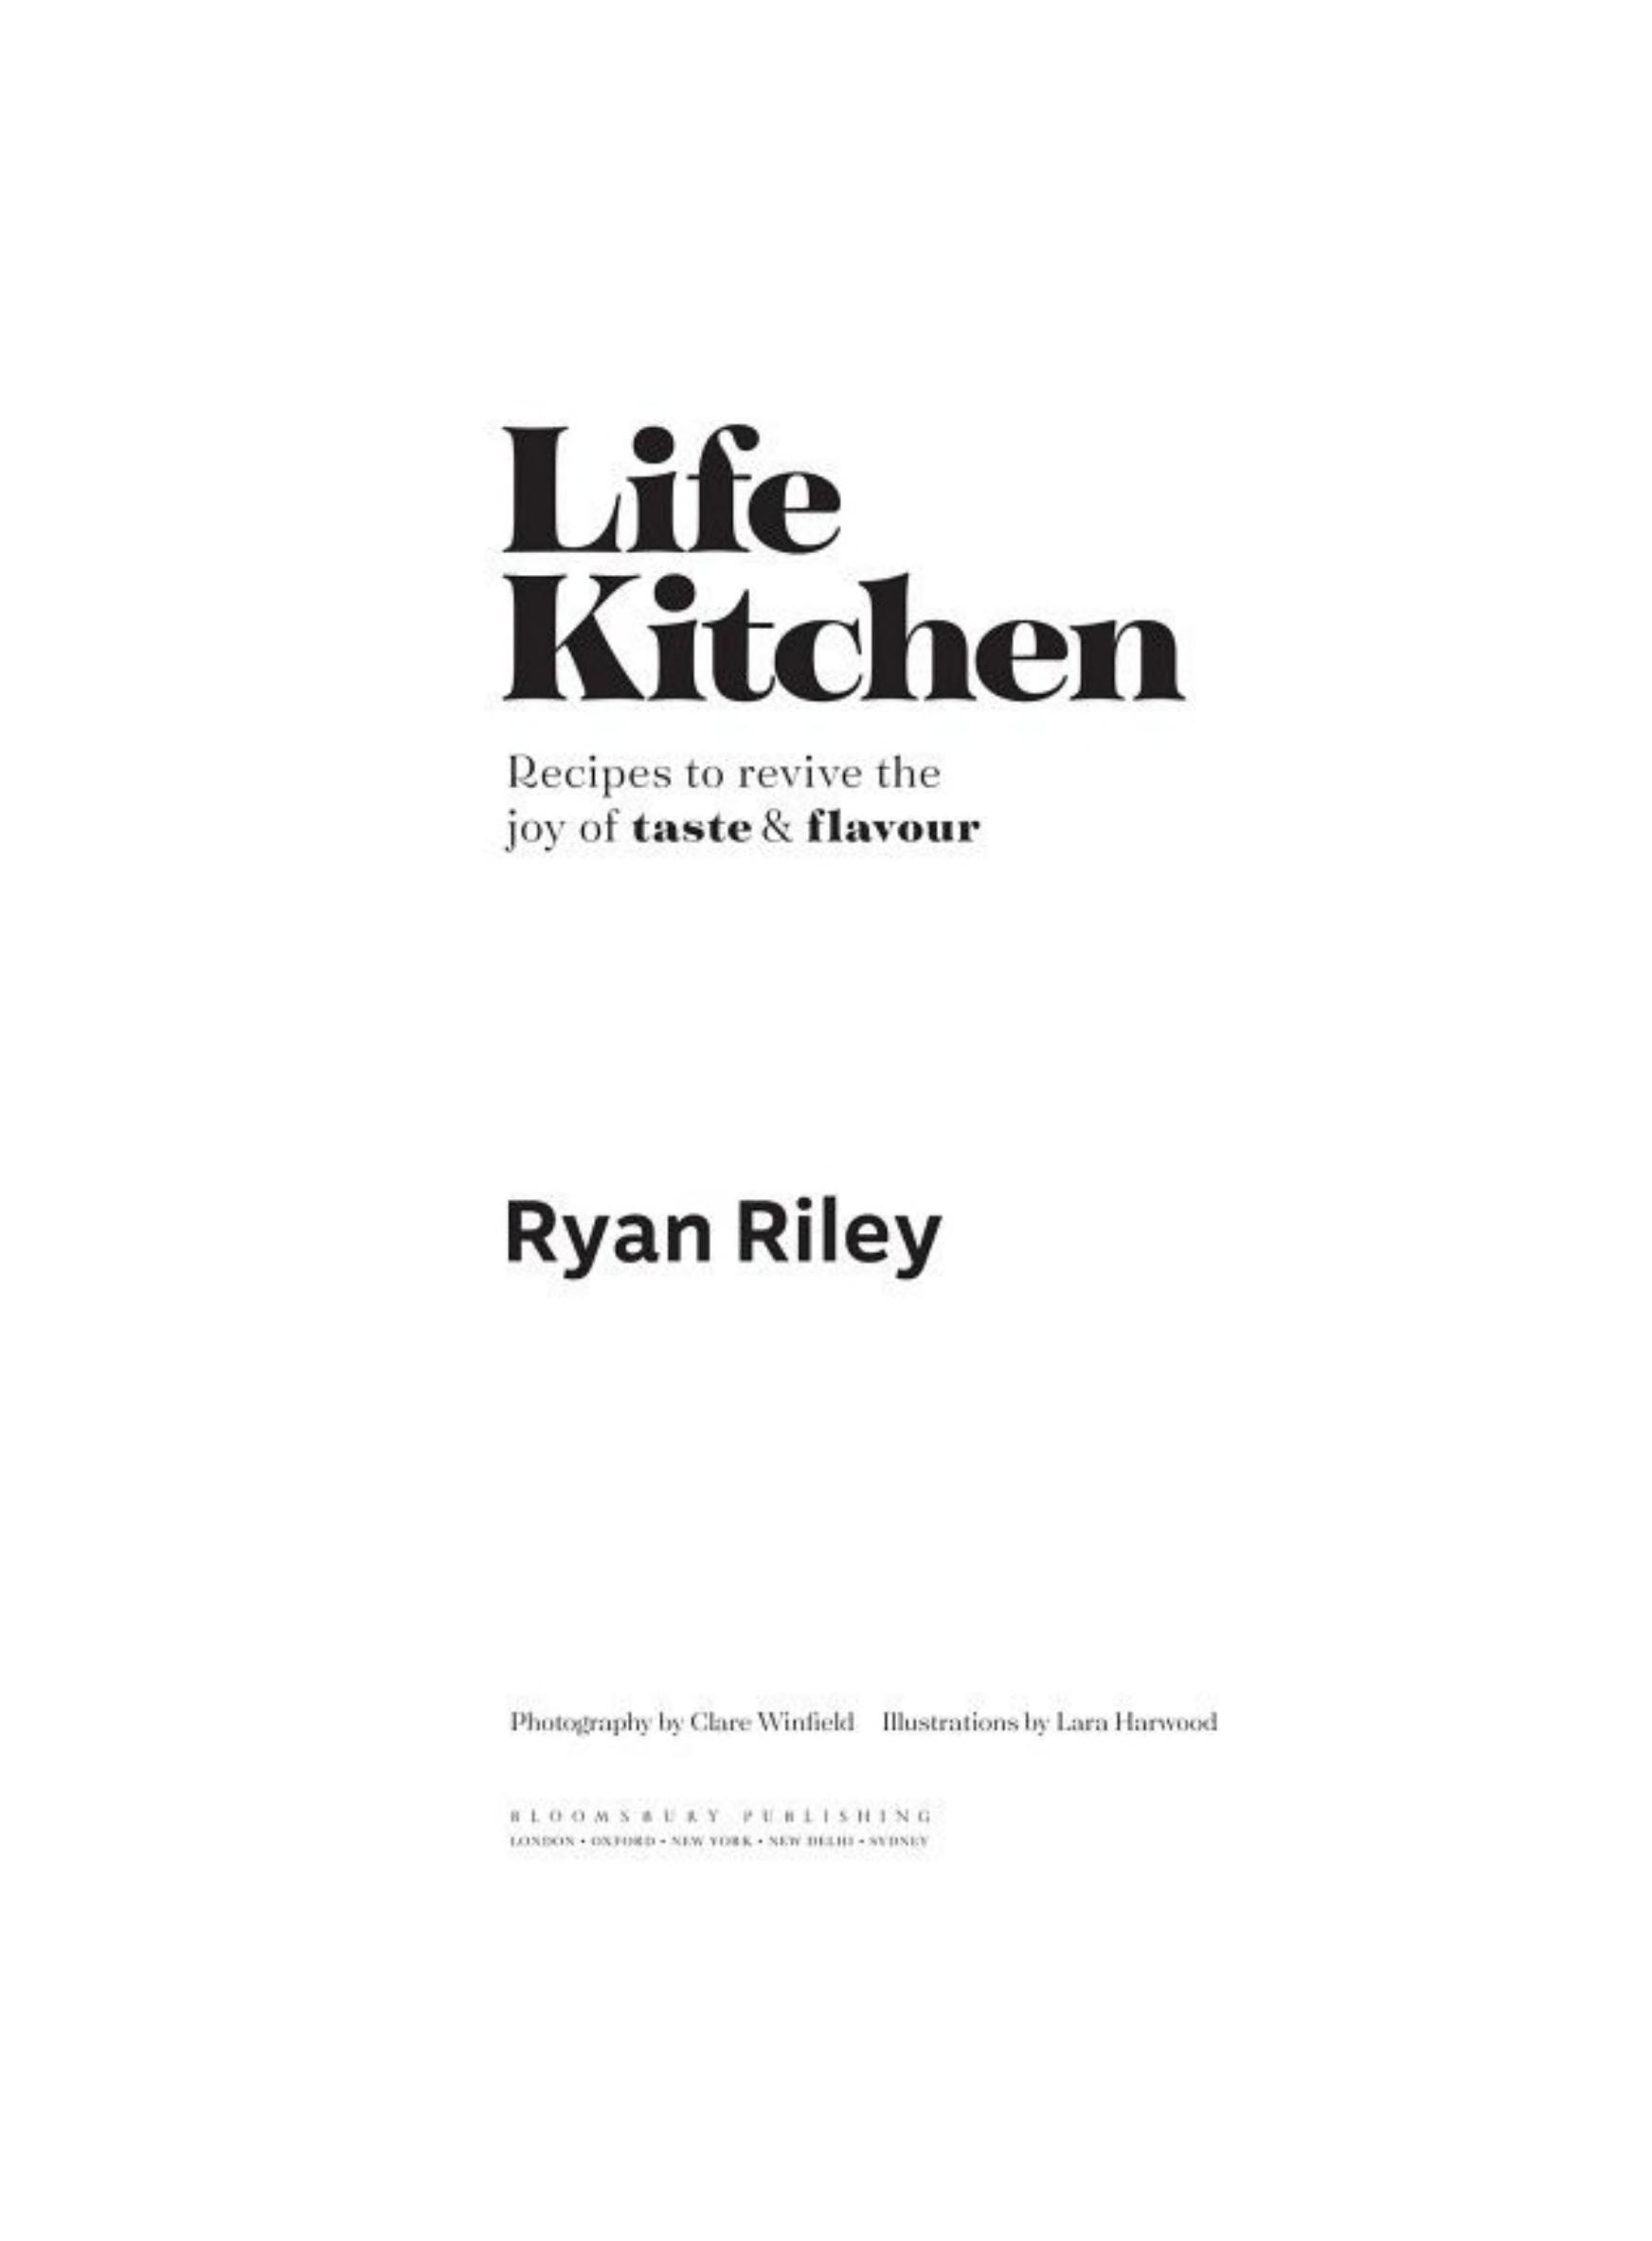 Life Kitchen